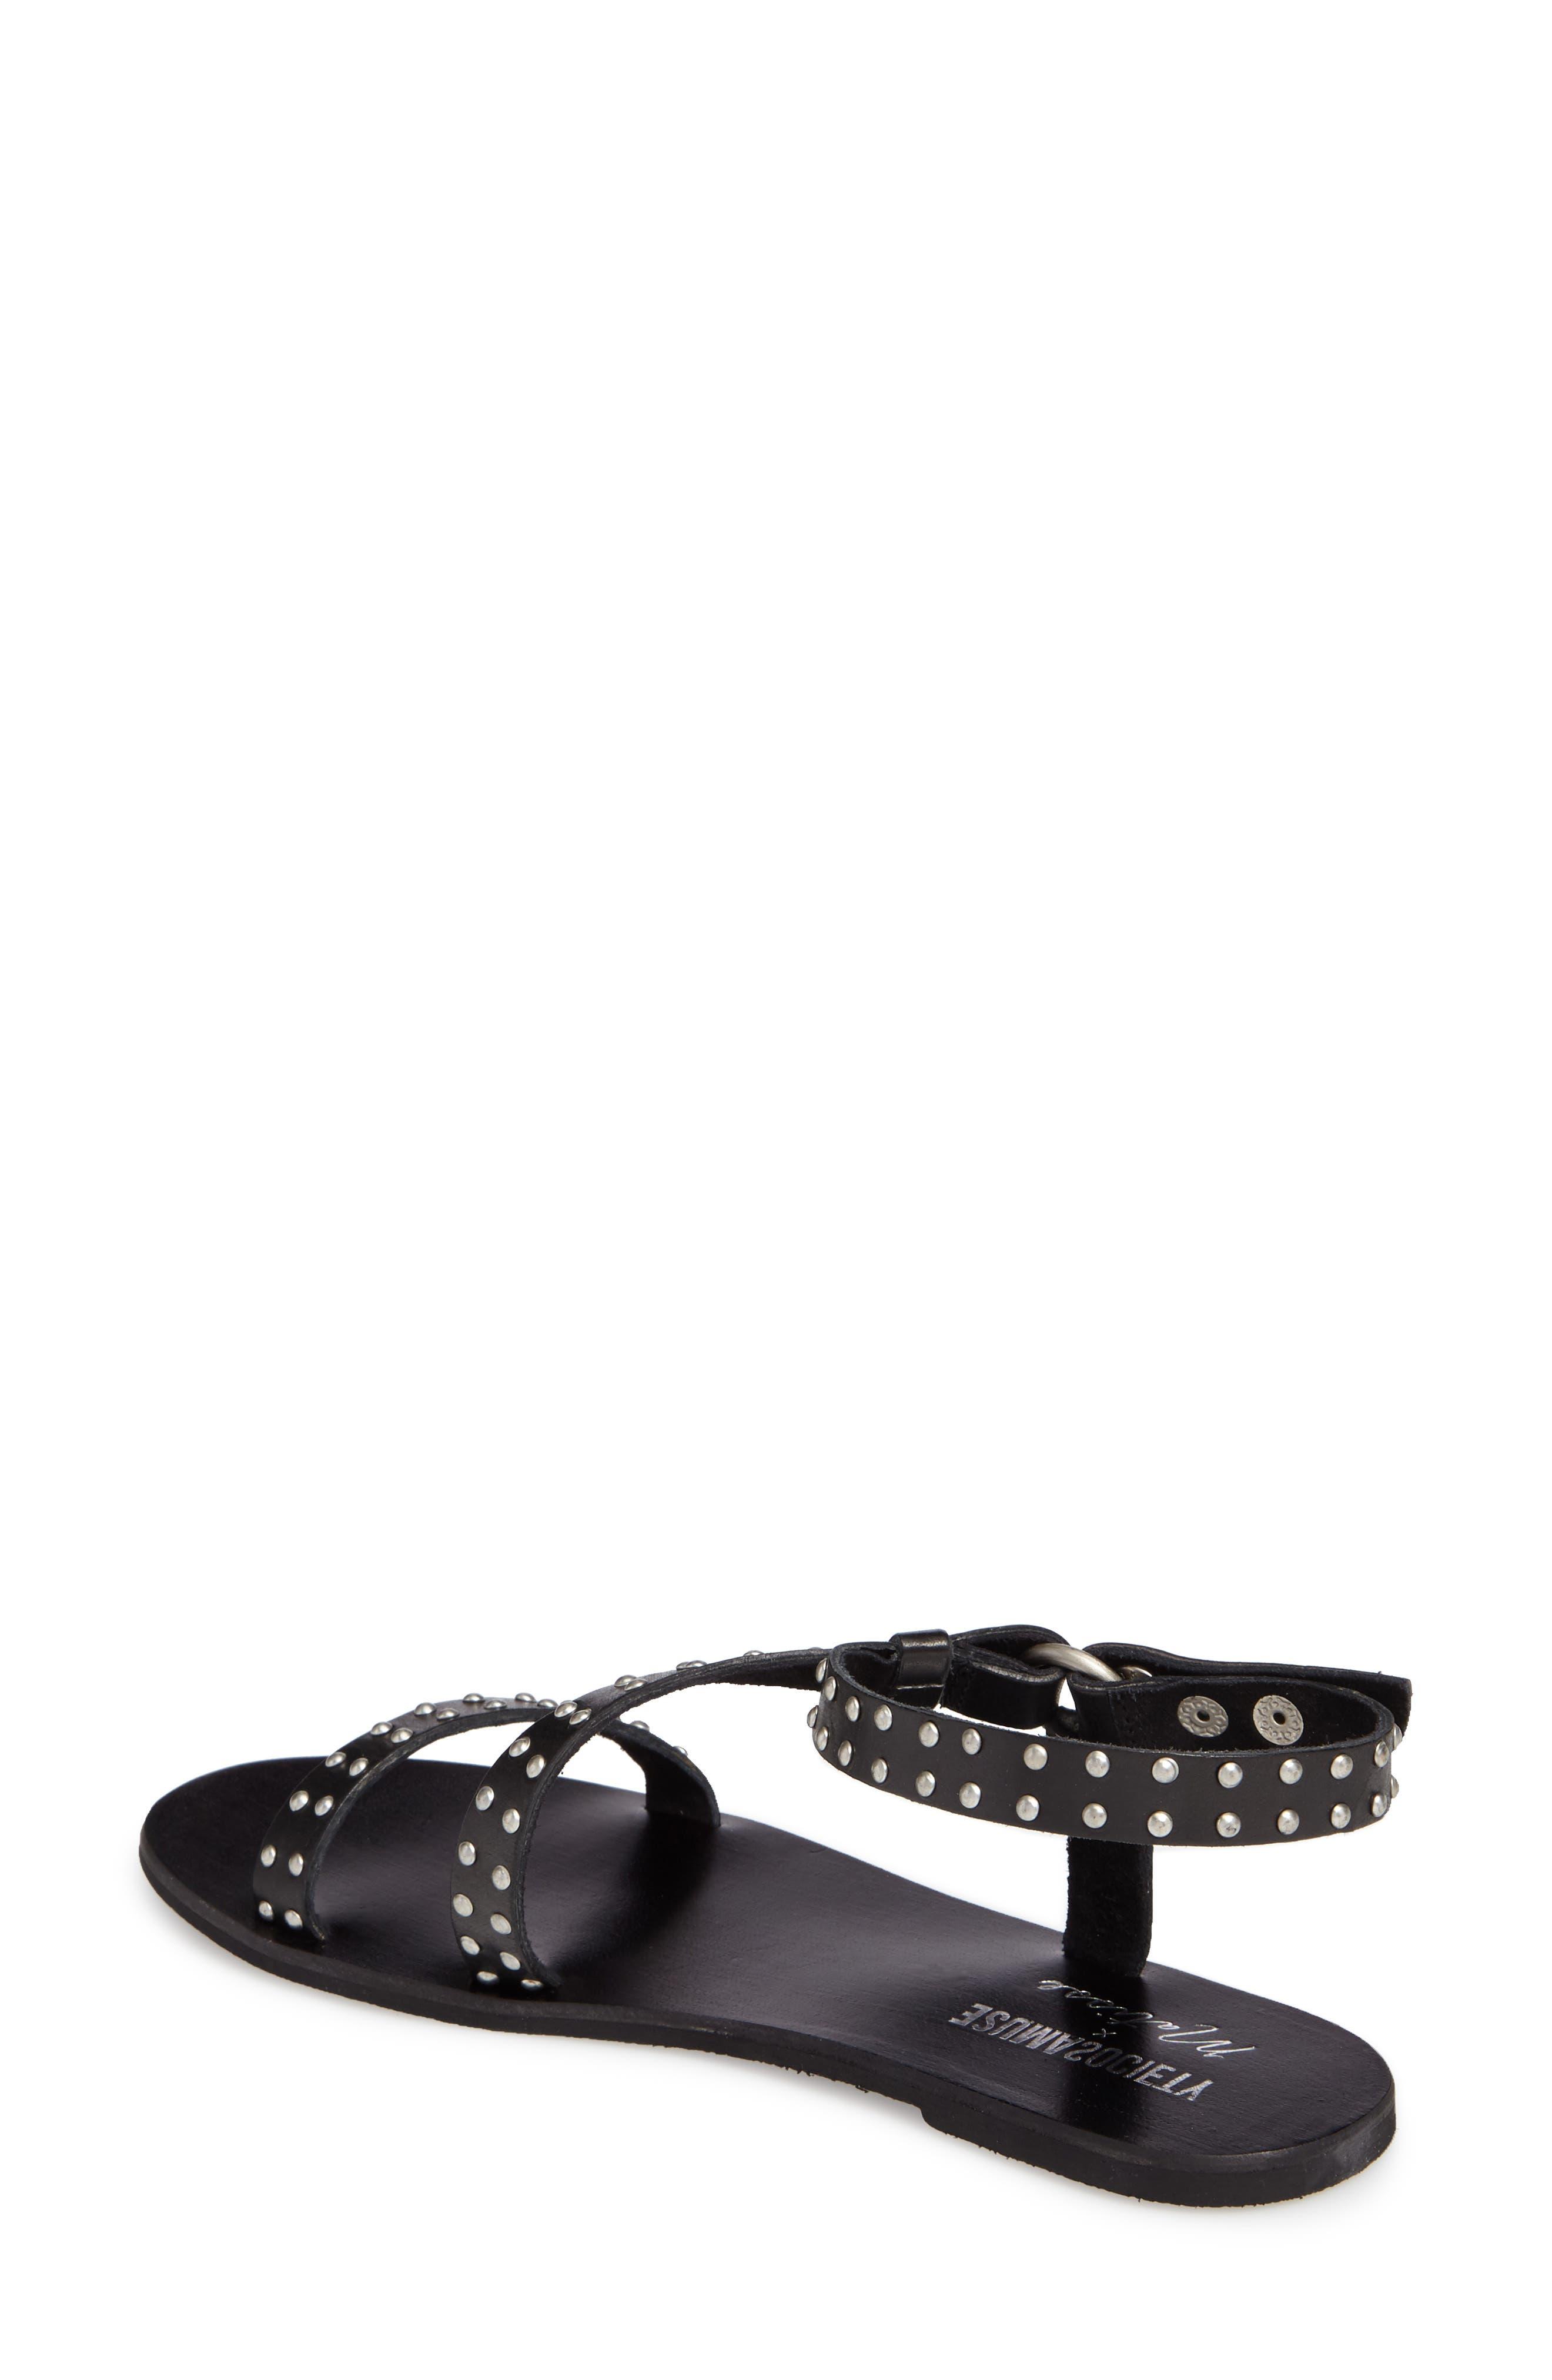 Alternate Image 2  - Amuse Society x Matisse Rock Muse Studded Sandal (Women)